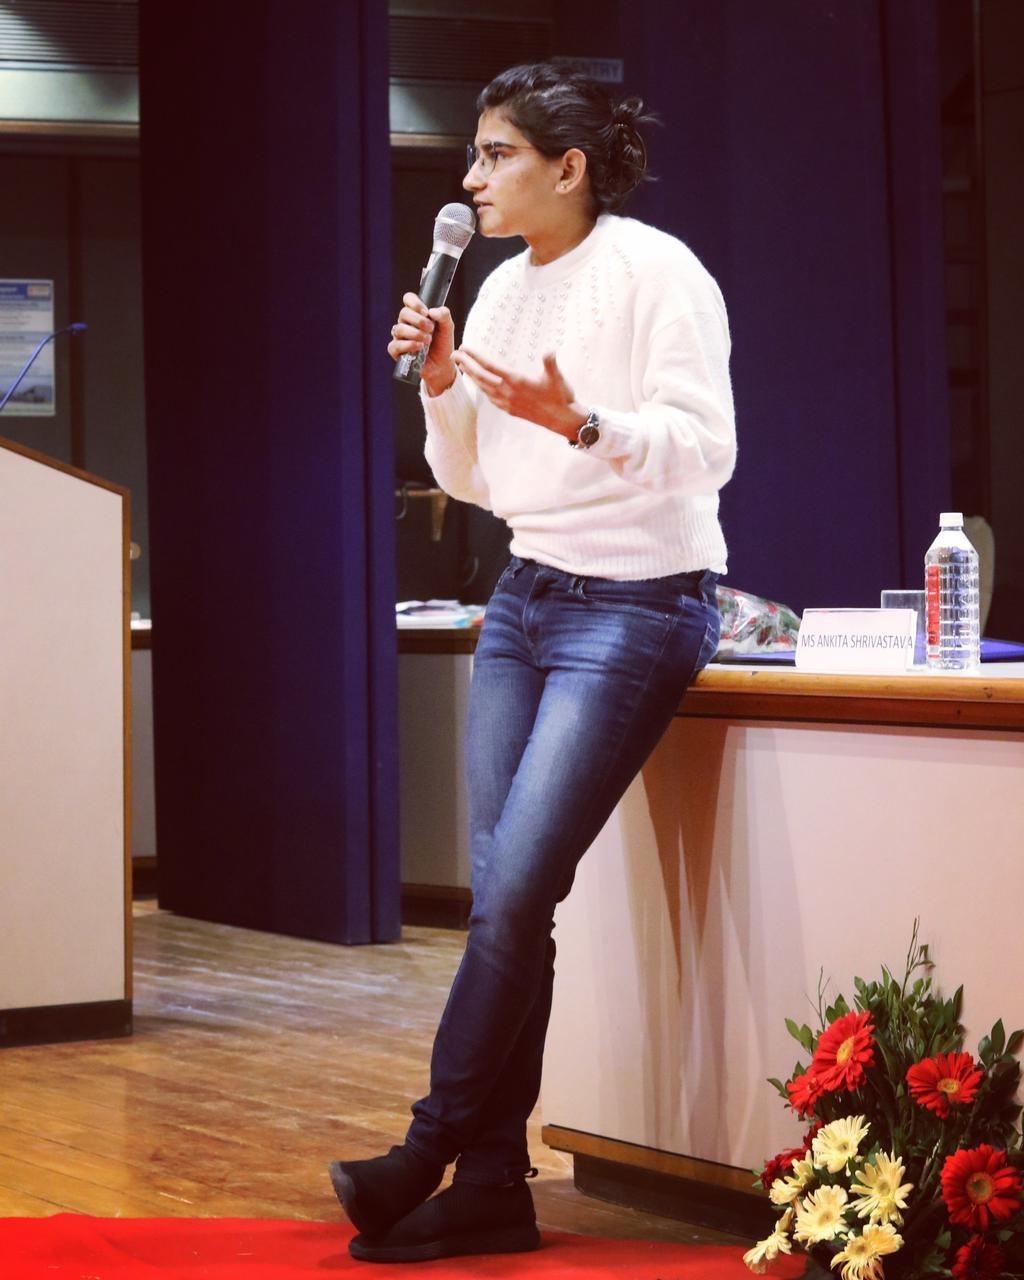 Ankita Shrivastava Experience. Liver donor and international athlete